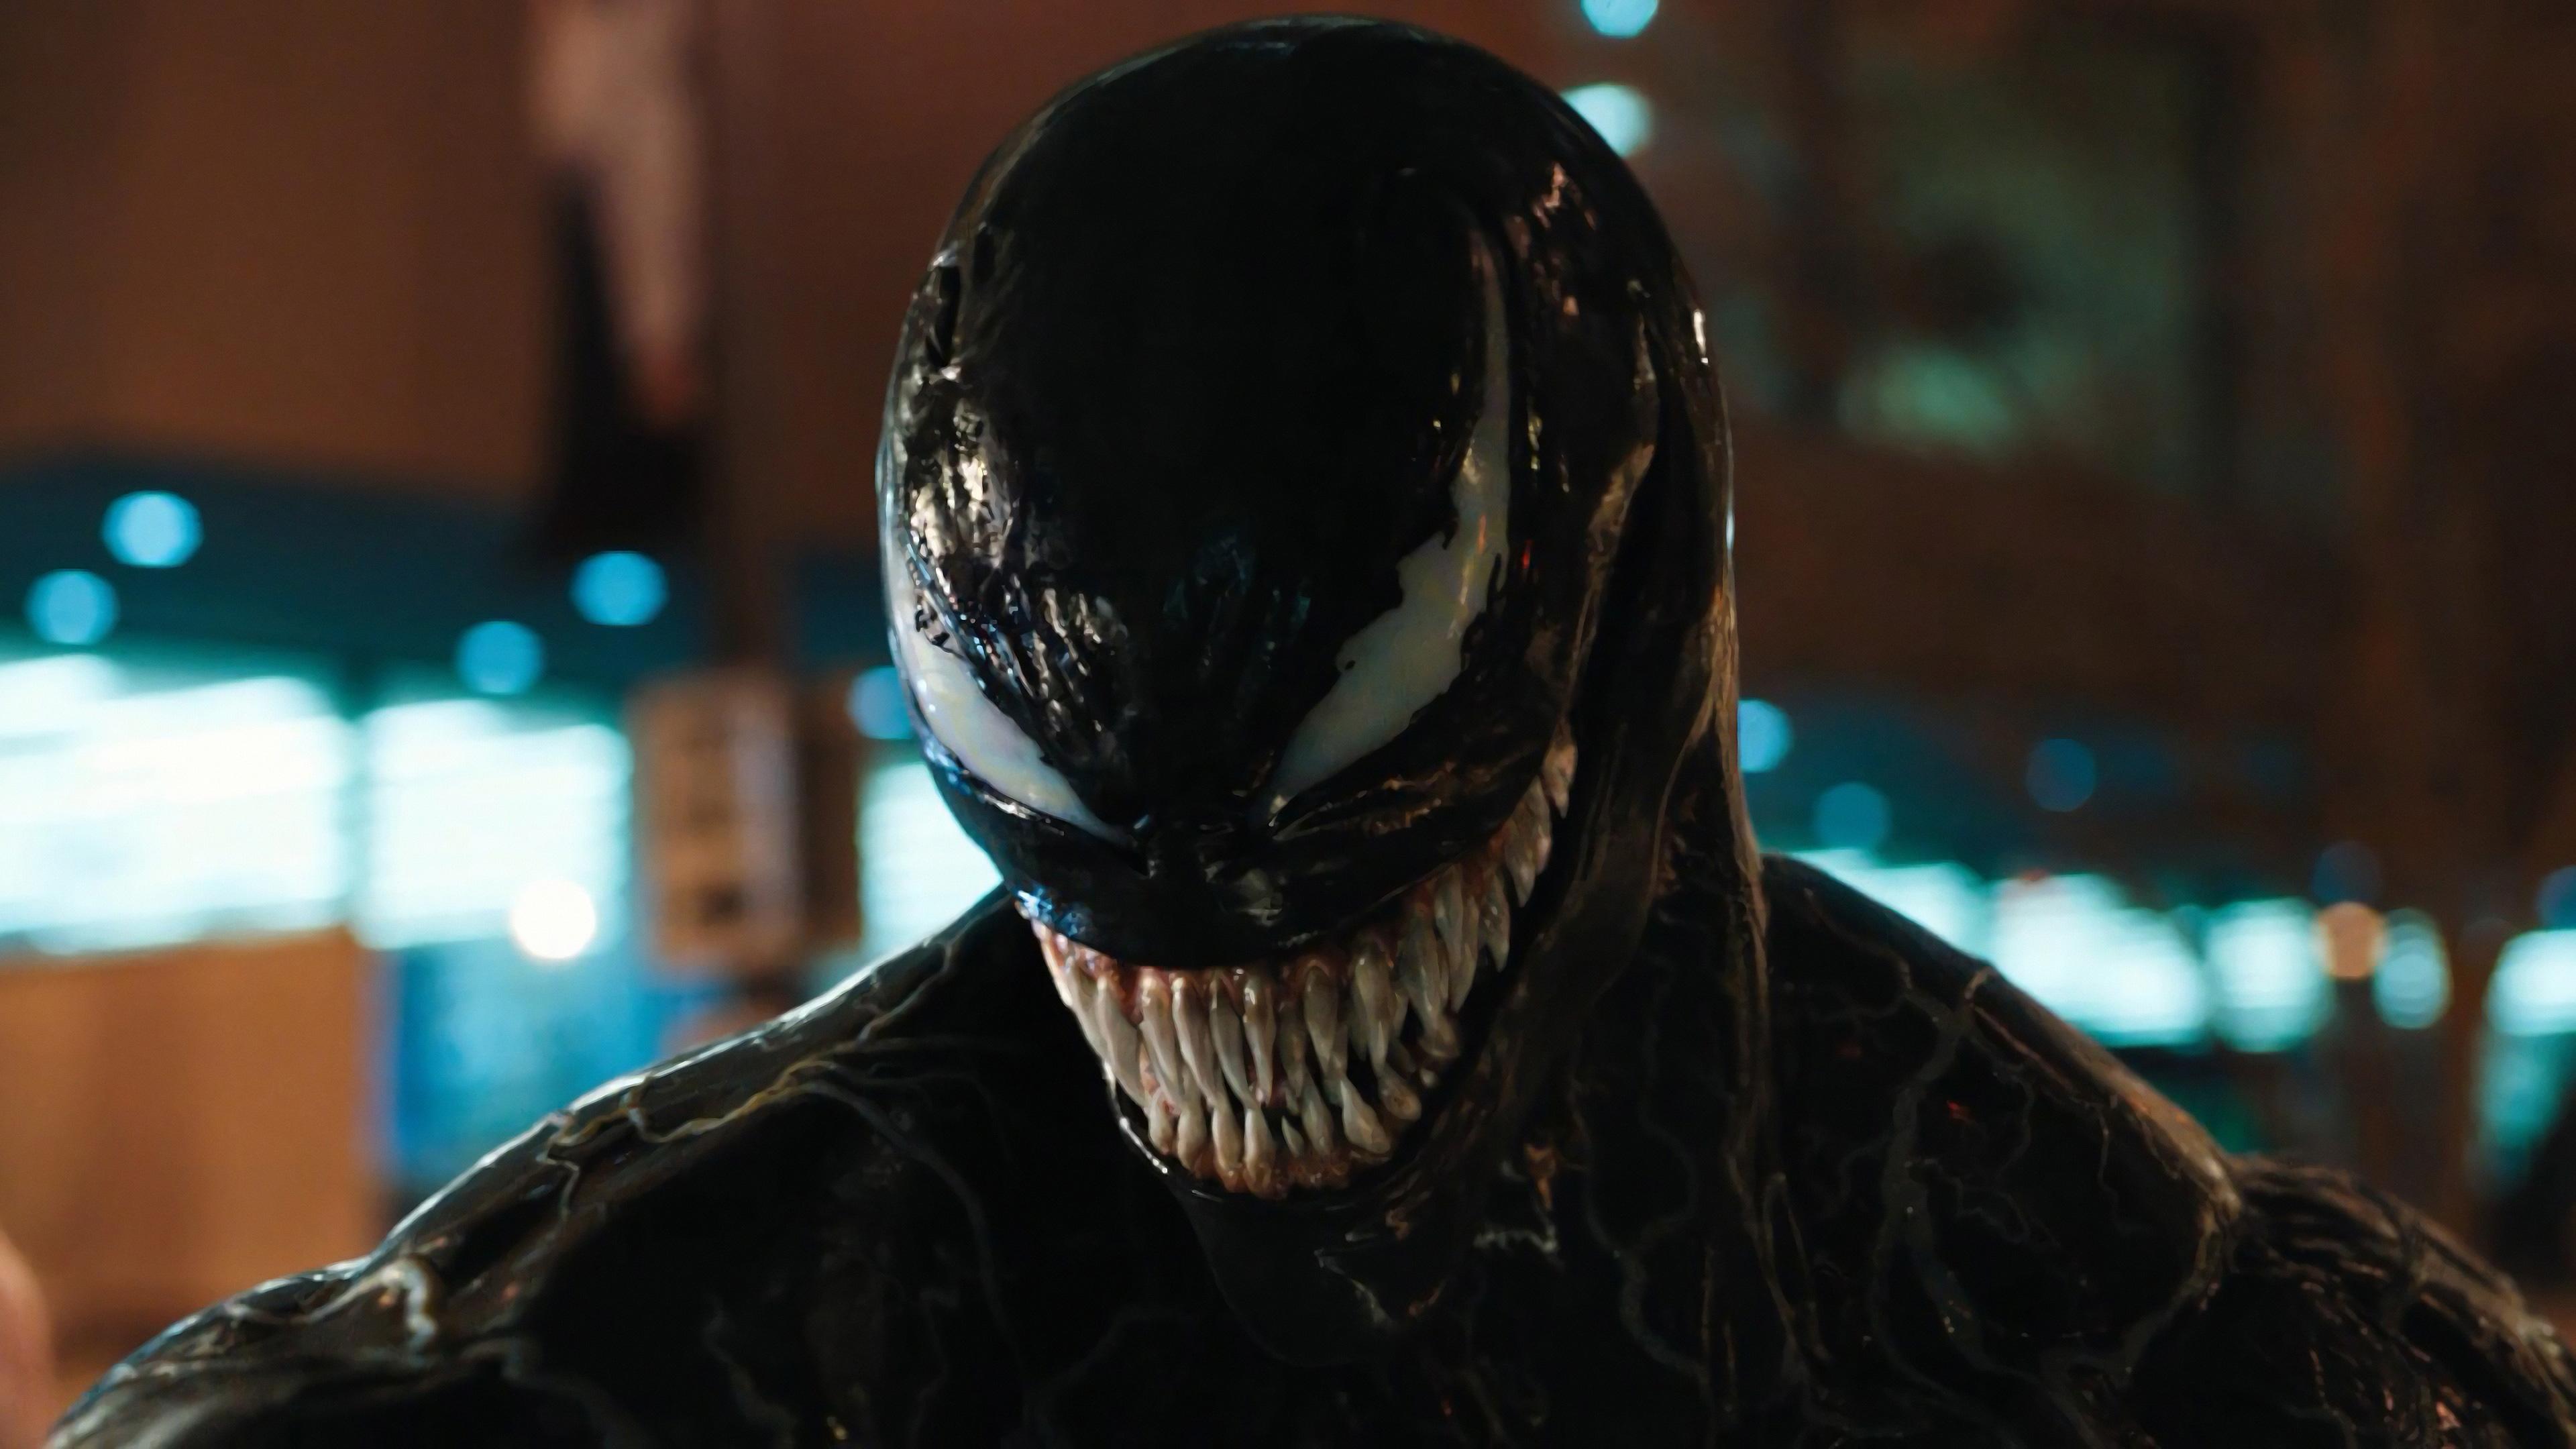 Wallpaper 4k Venom 4k Movie 2018 2018 Movies Wallpapers 4k